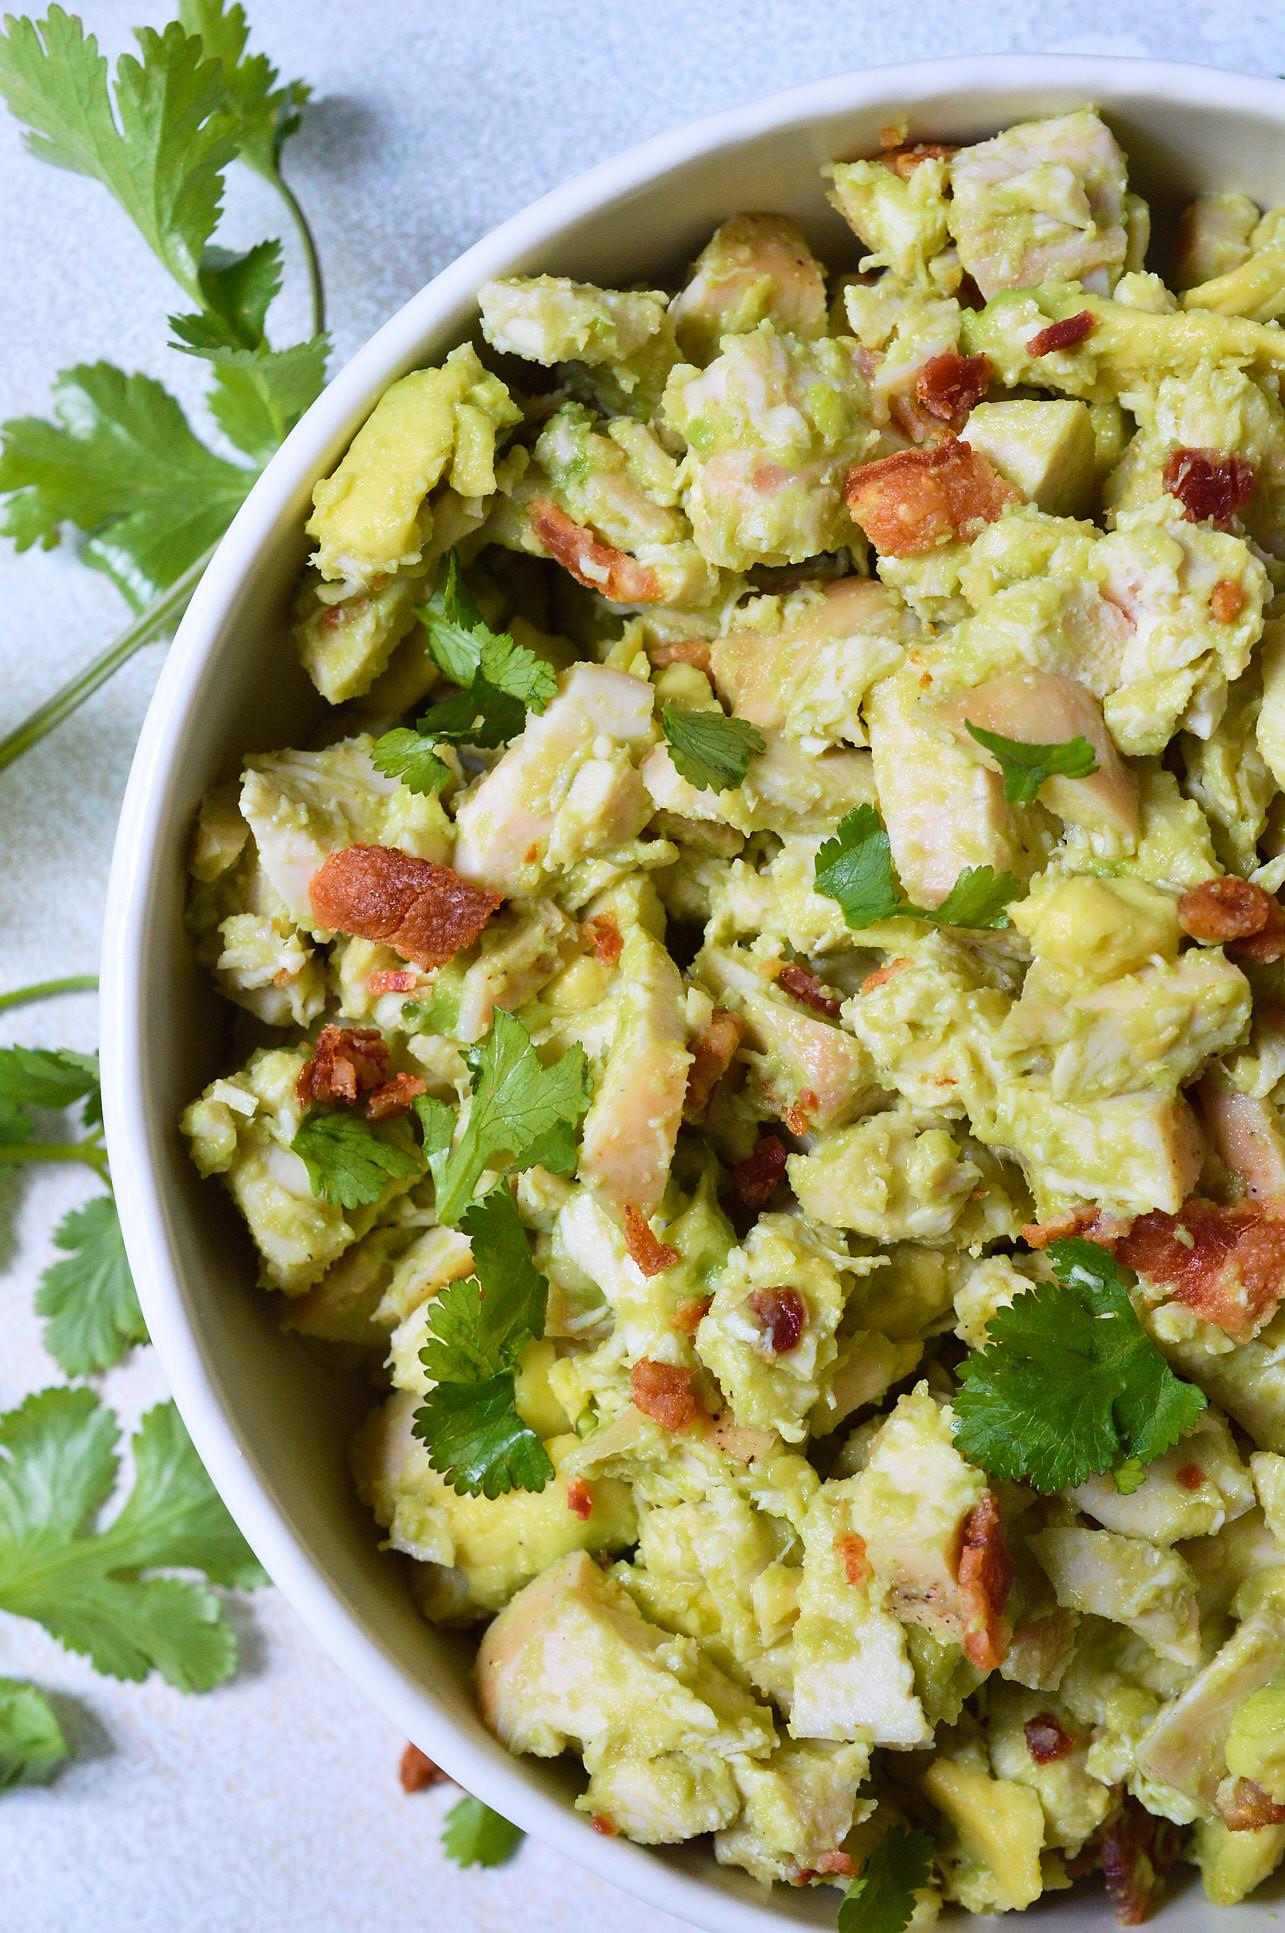 Chicken Salad Recipes Healthy  Bacon Avocado Chicken Salad Whole30 Recipe WonkyWonderful